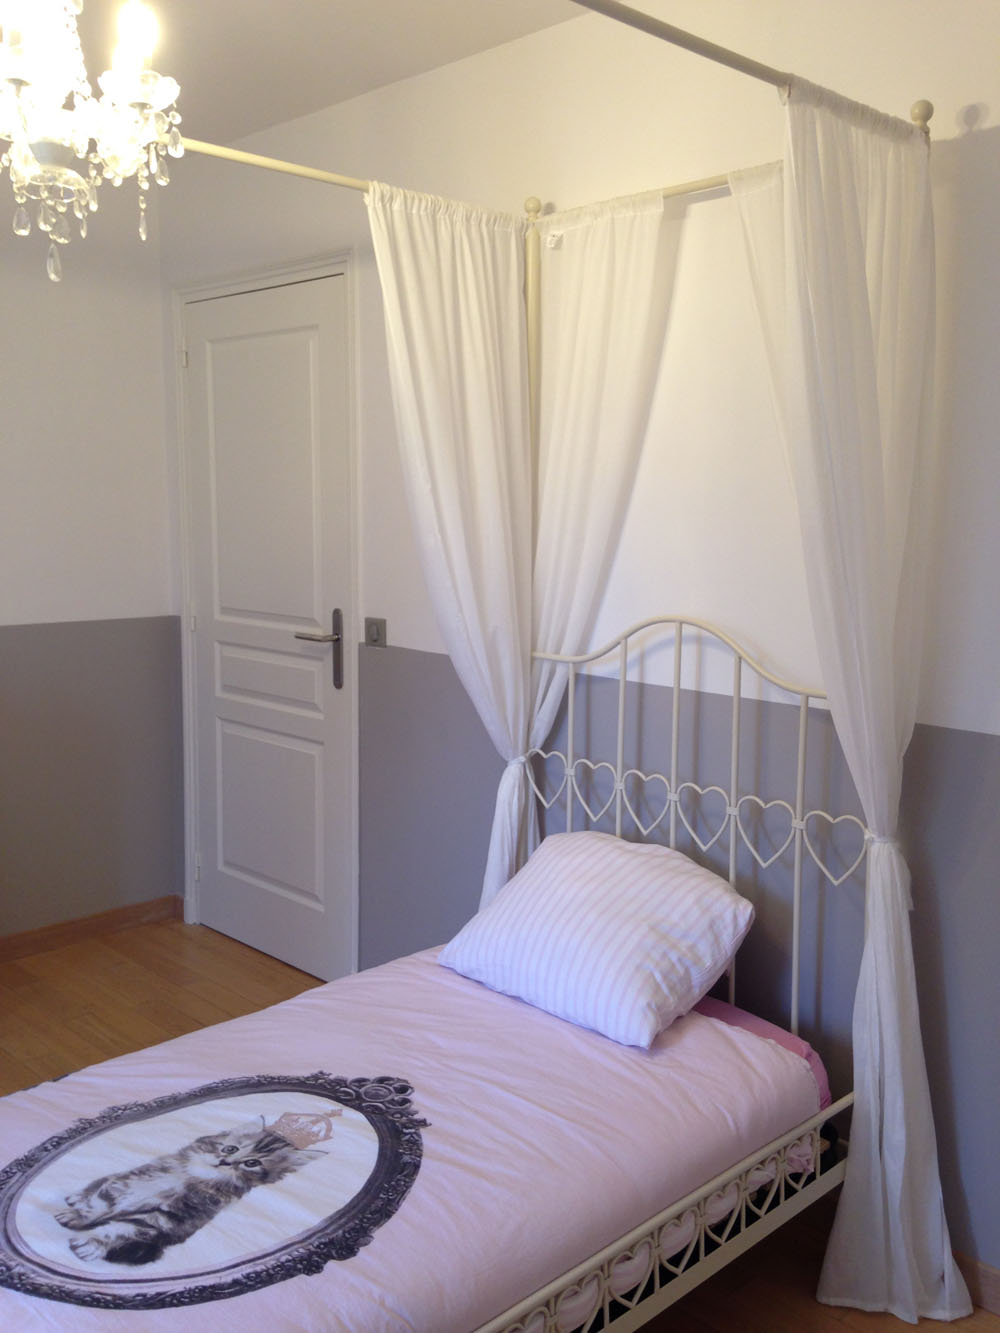 accessoire chambre ado fille objet deco chambre ado accessoire chambre fille londres. Black Bedroom Furniture Sets. Home Design Ideas